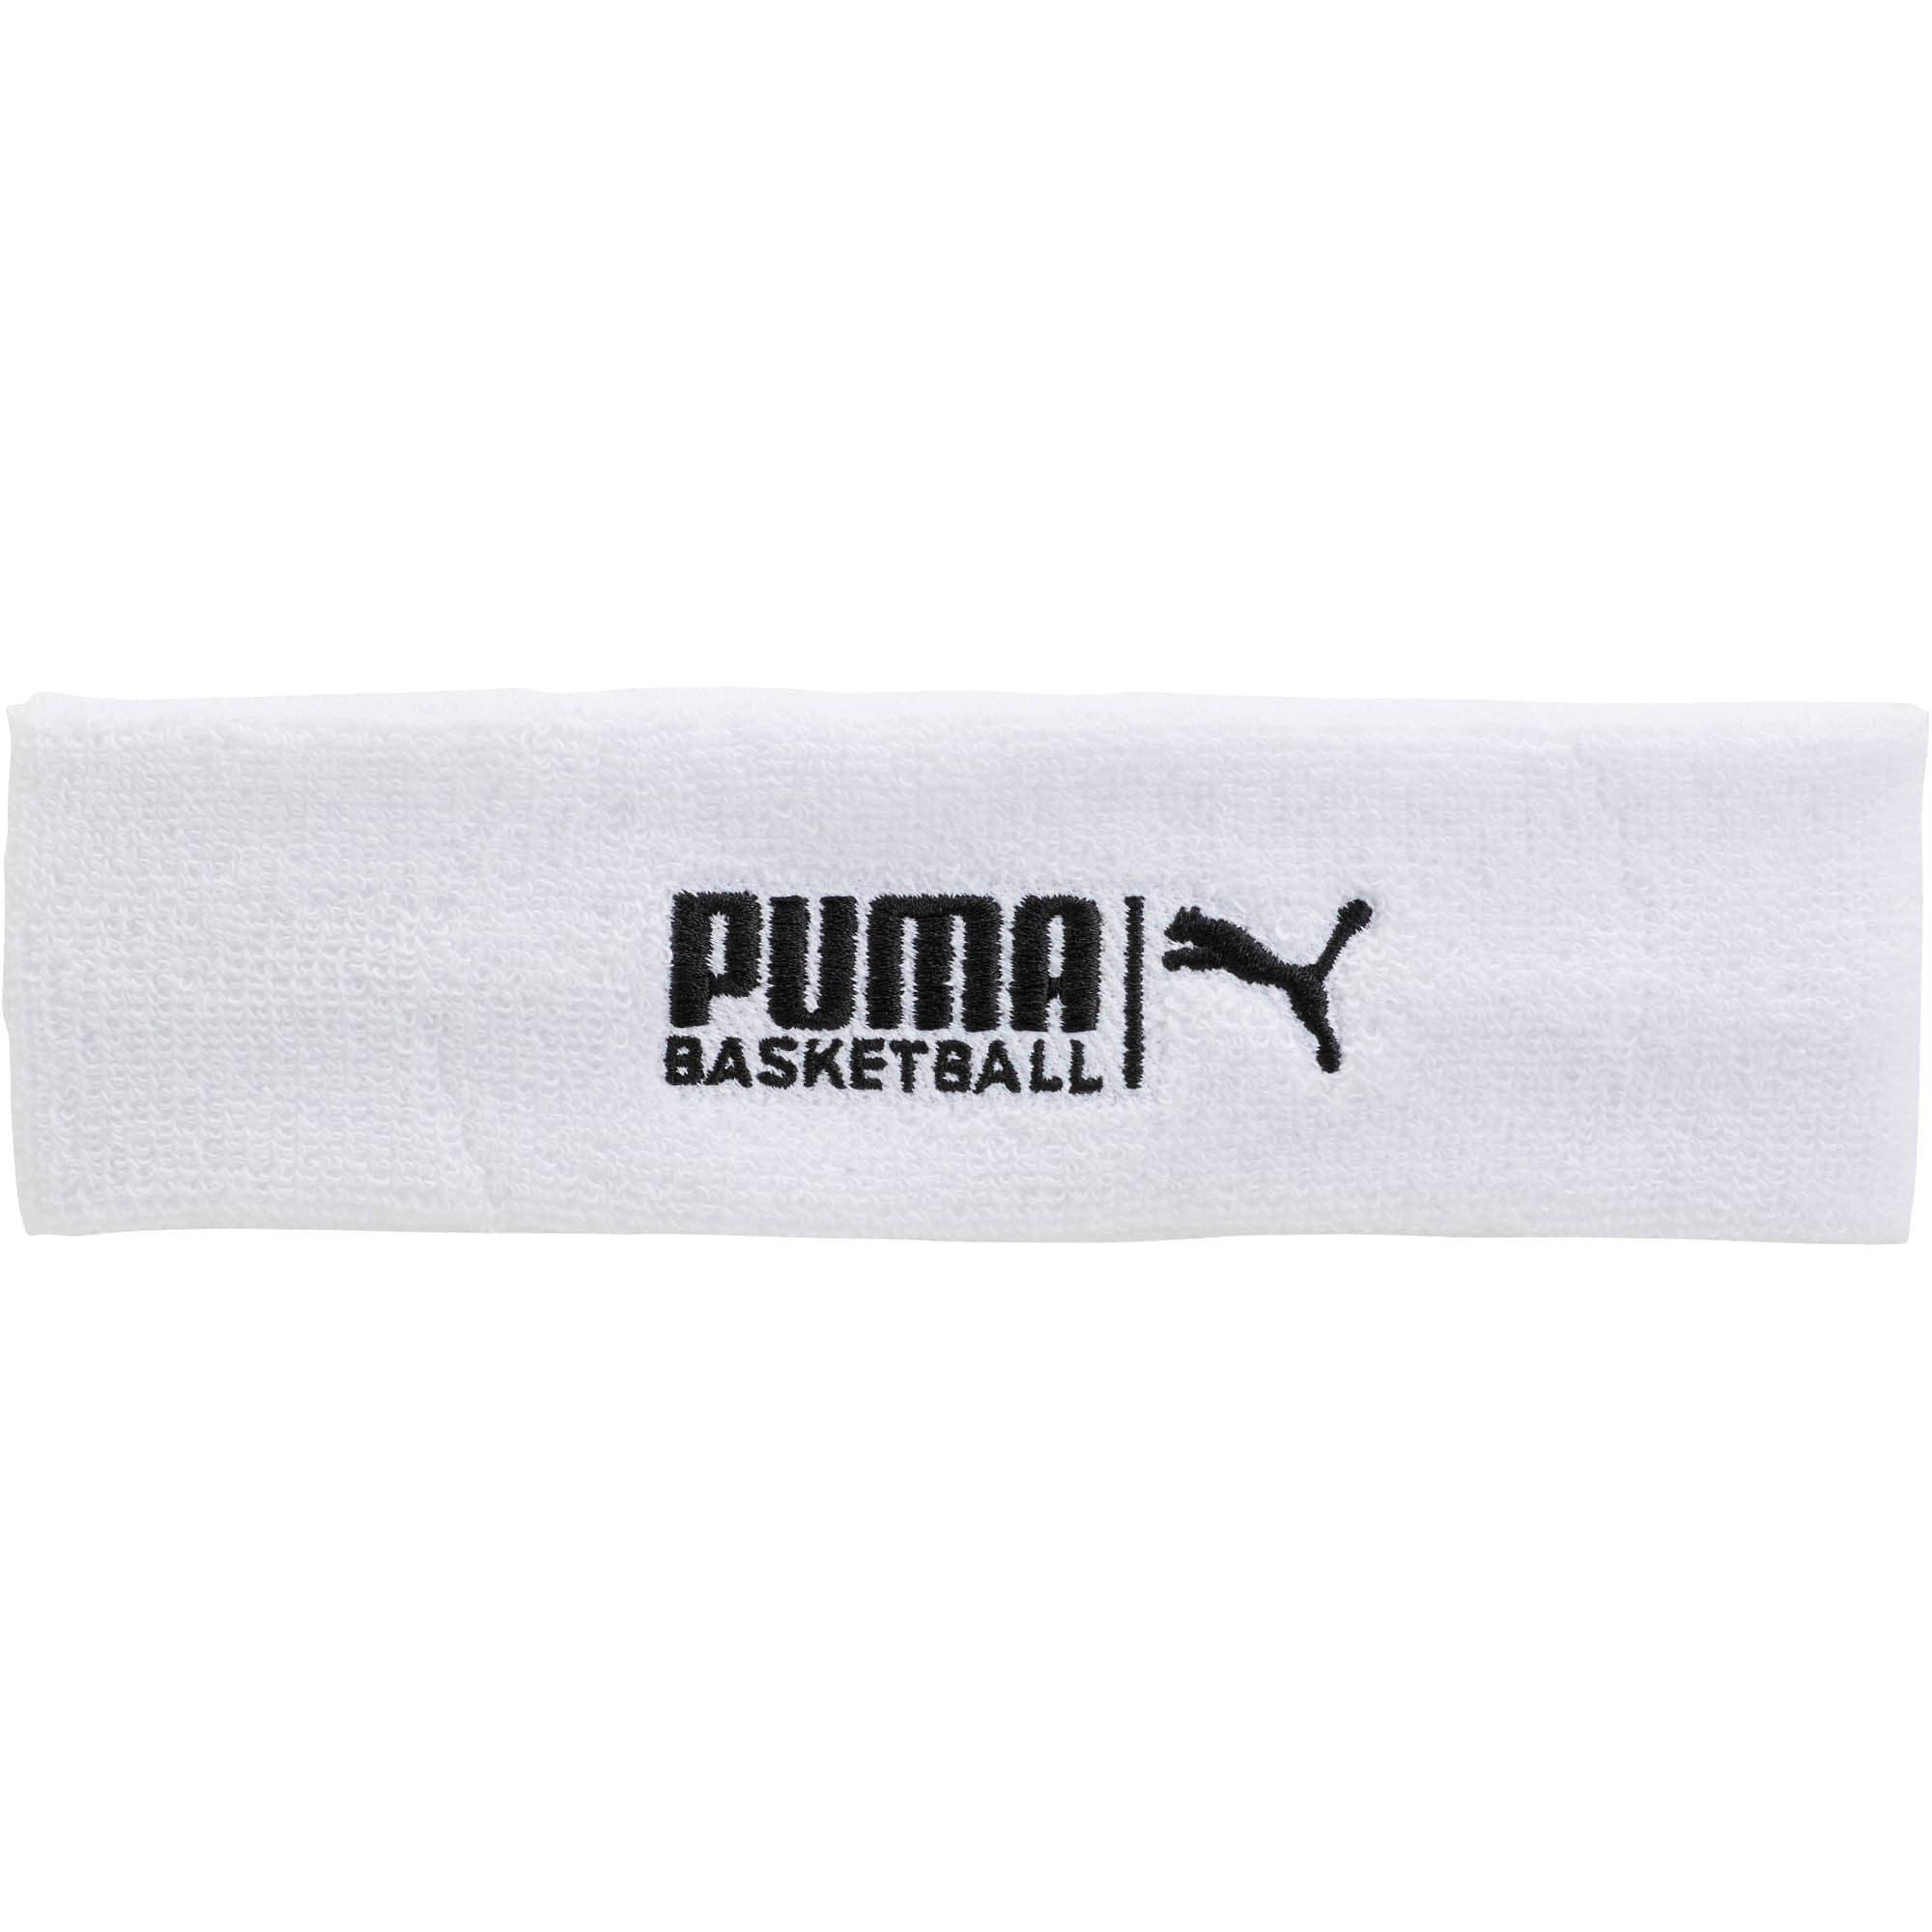 Thumbnail 1 of PUMA Basketball Sweat Headband, WHITE / BLACK, medium